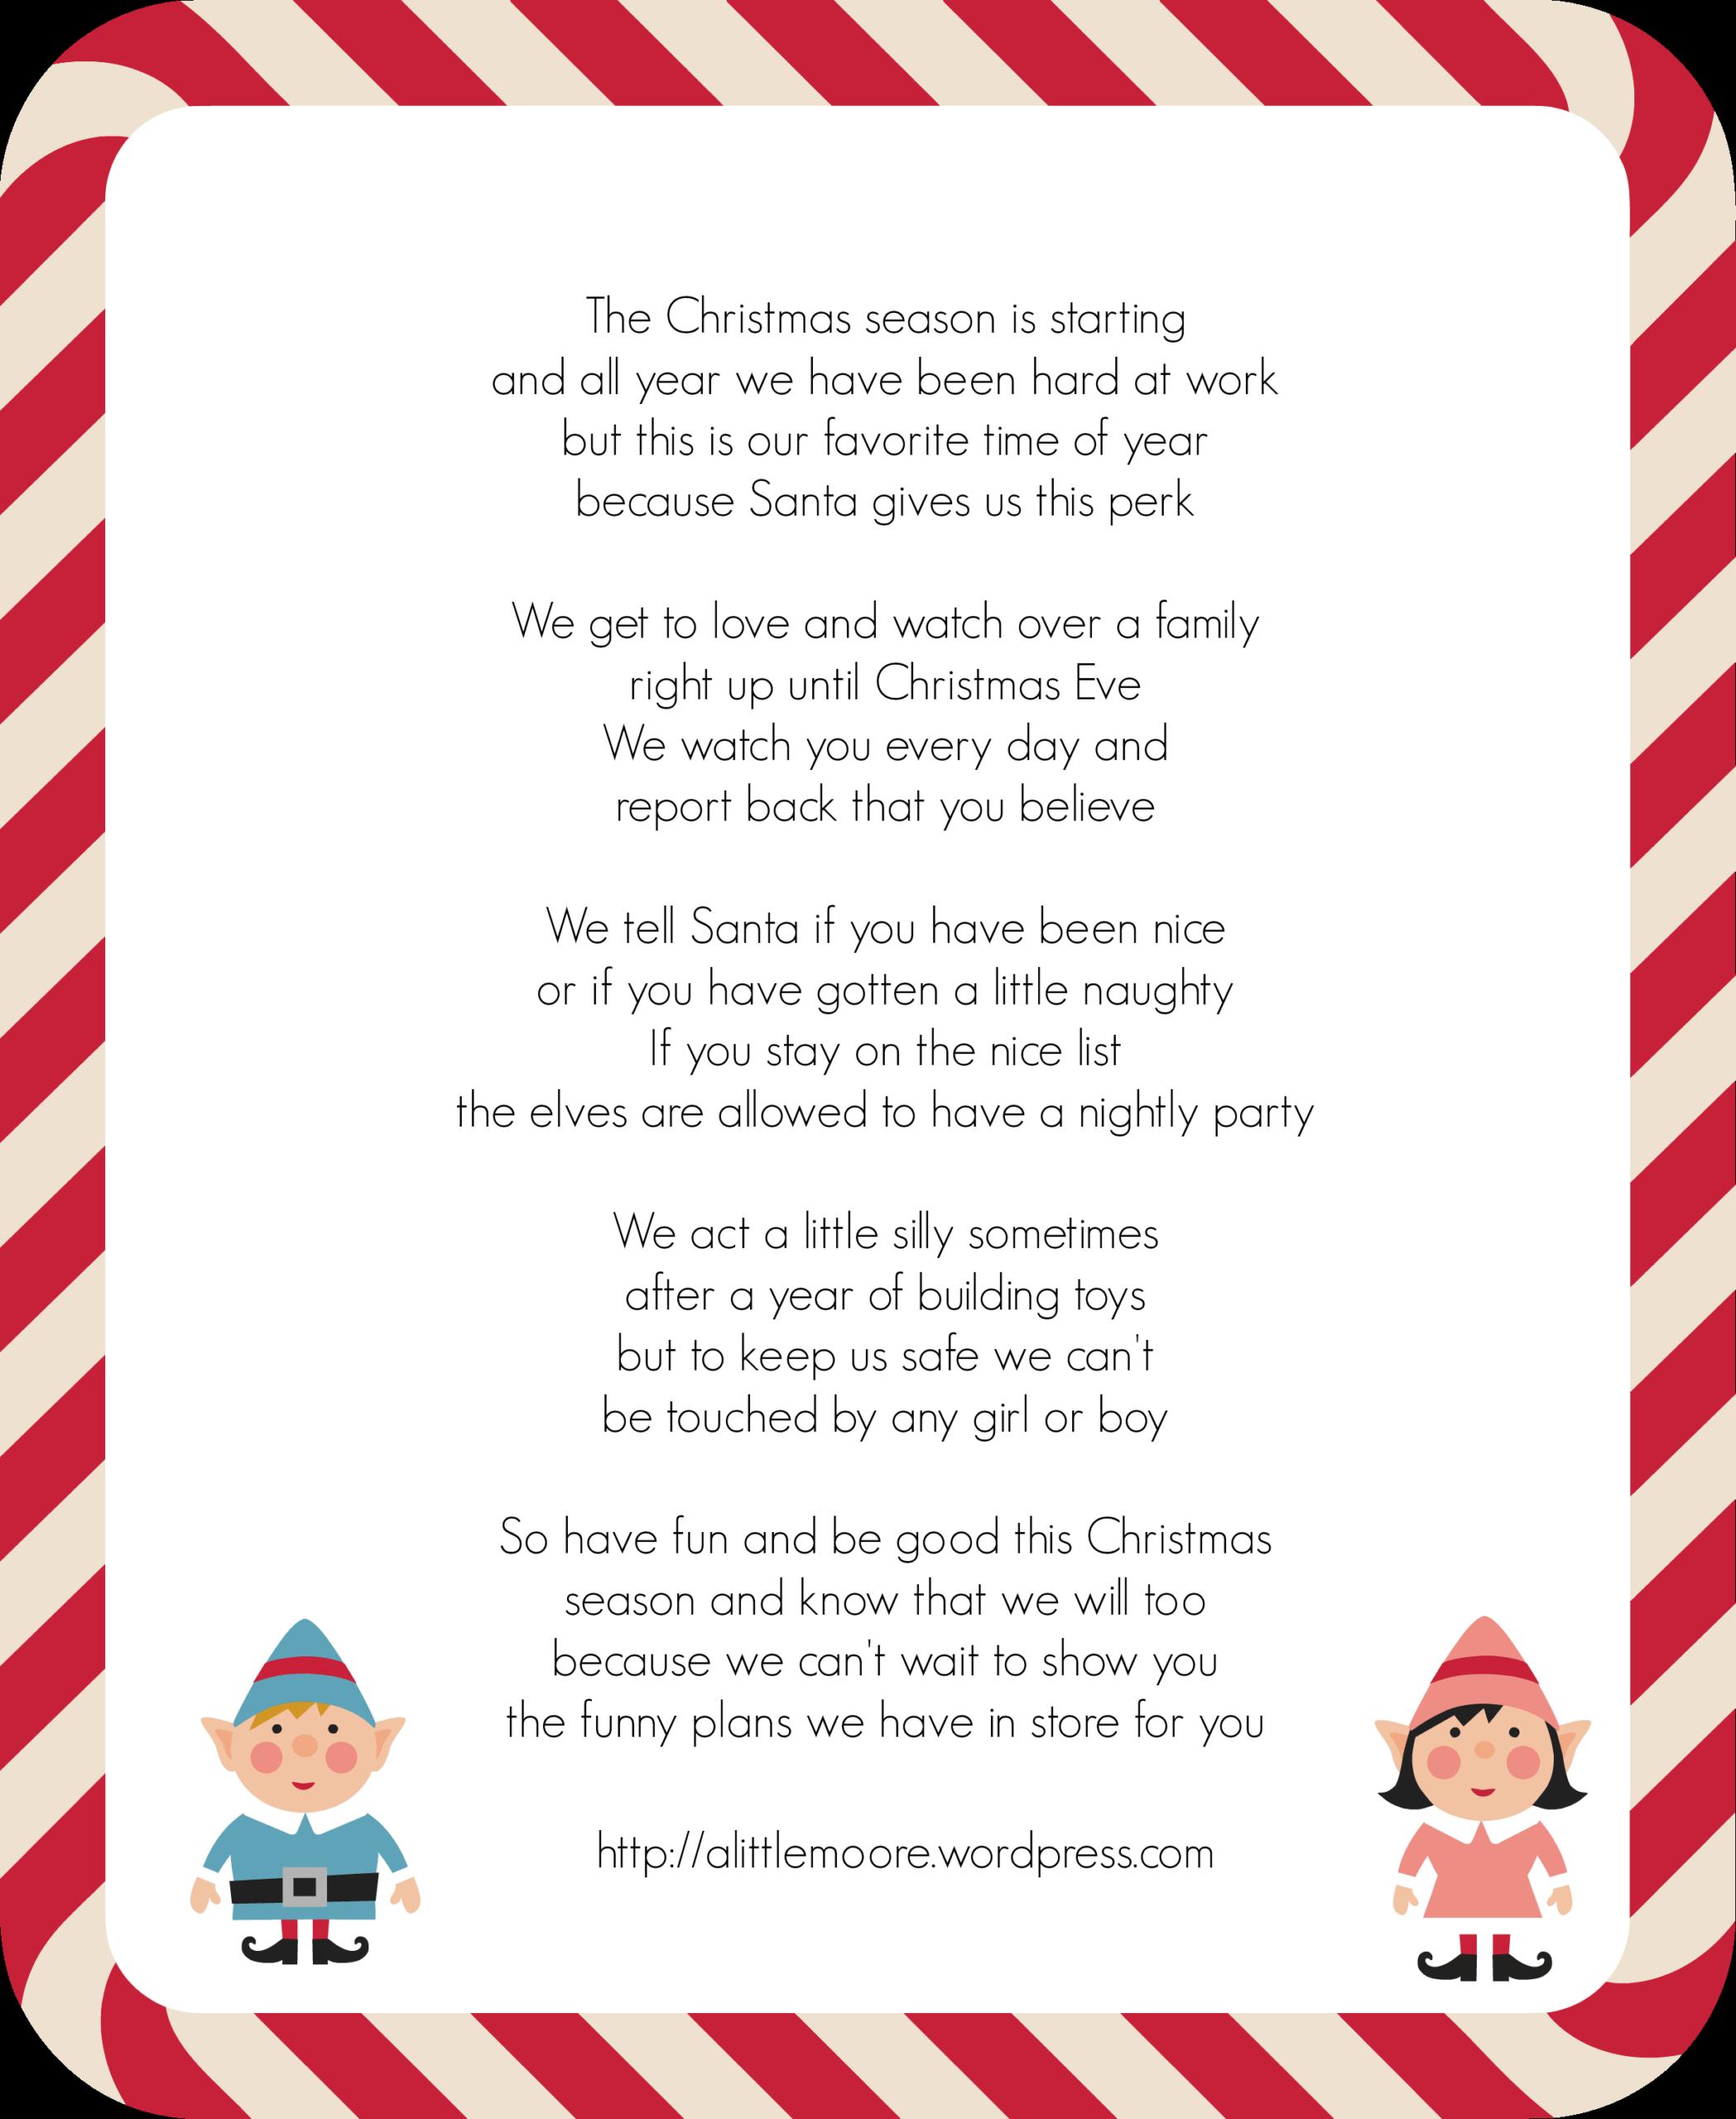 002 Santa2Bletter2B252812529 Template Ideas Elf On The Shelf Regarding Elf On The Shelf Letter From Santa Template